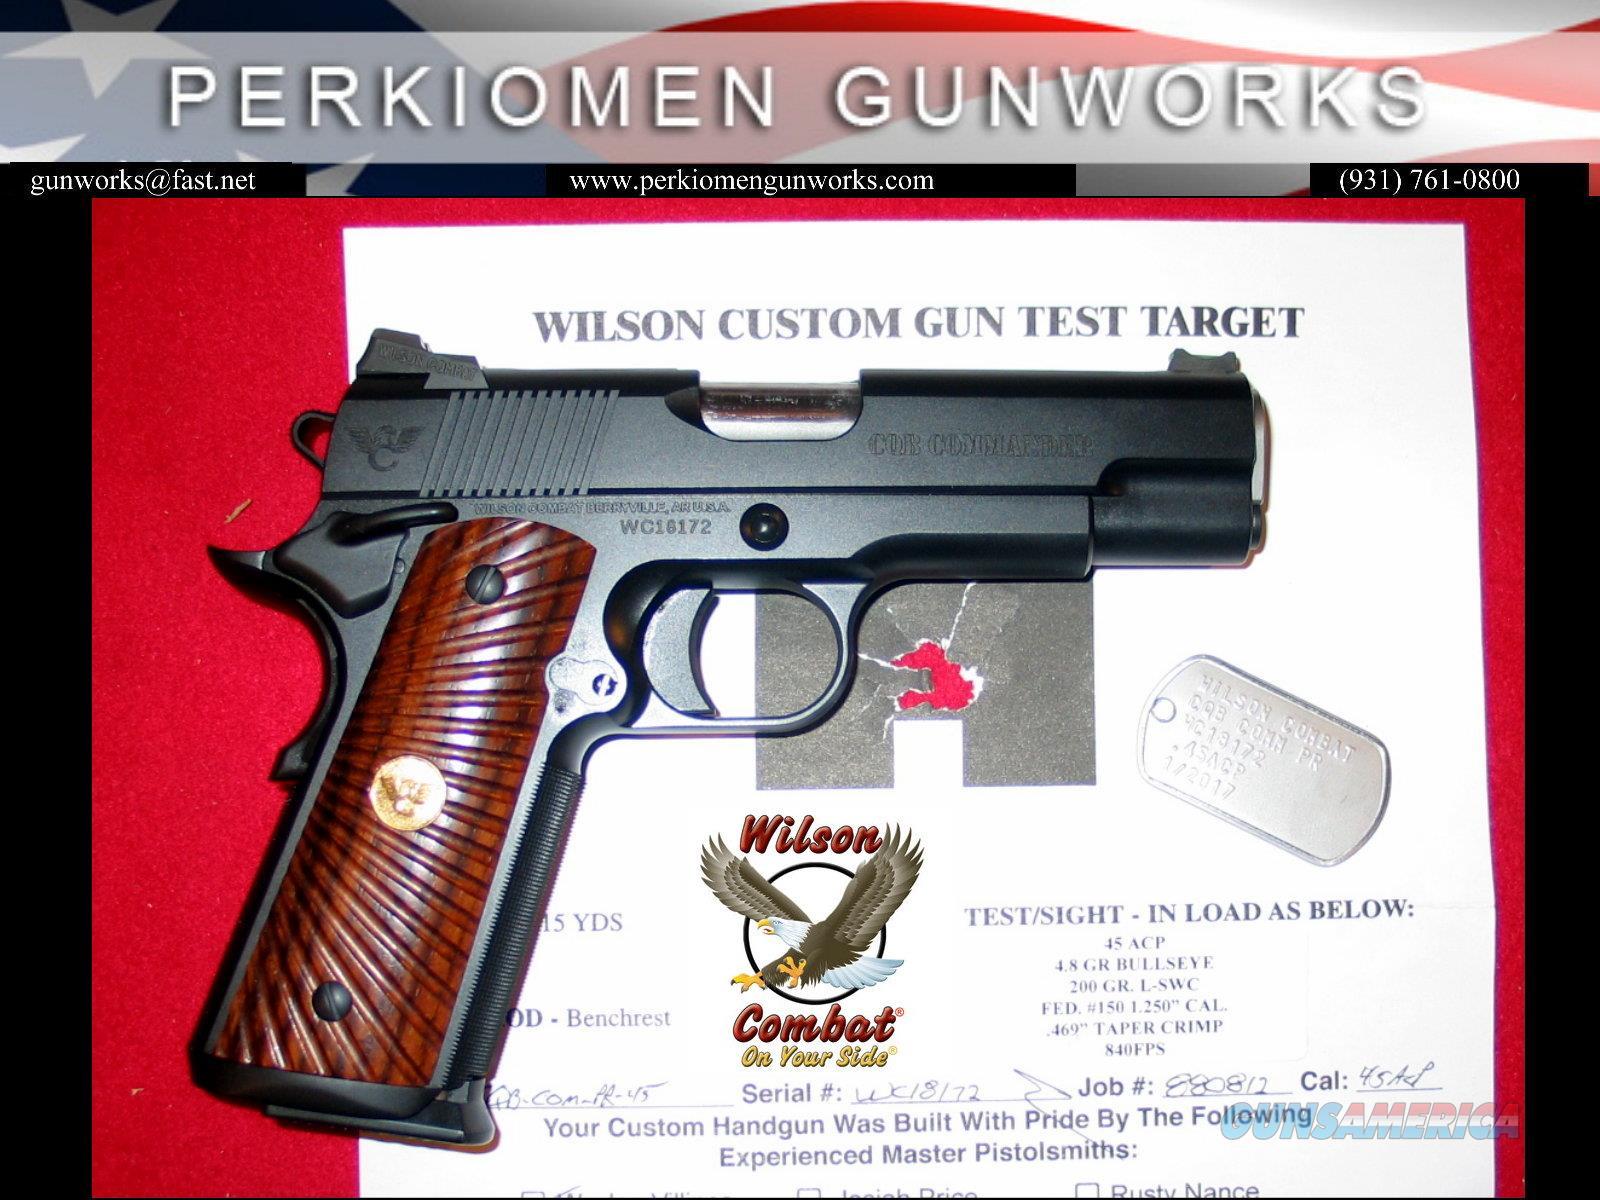 CQB Commander Armor-Tuff .45acp with Upgrades, New in case.  Guns > Pistols > Wilson Combat Pistols